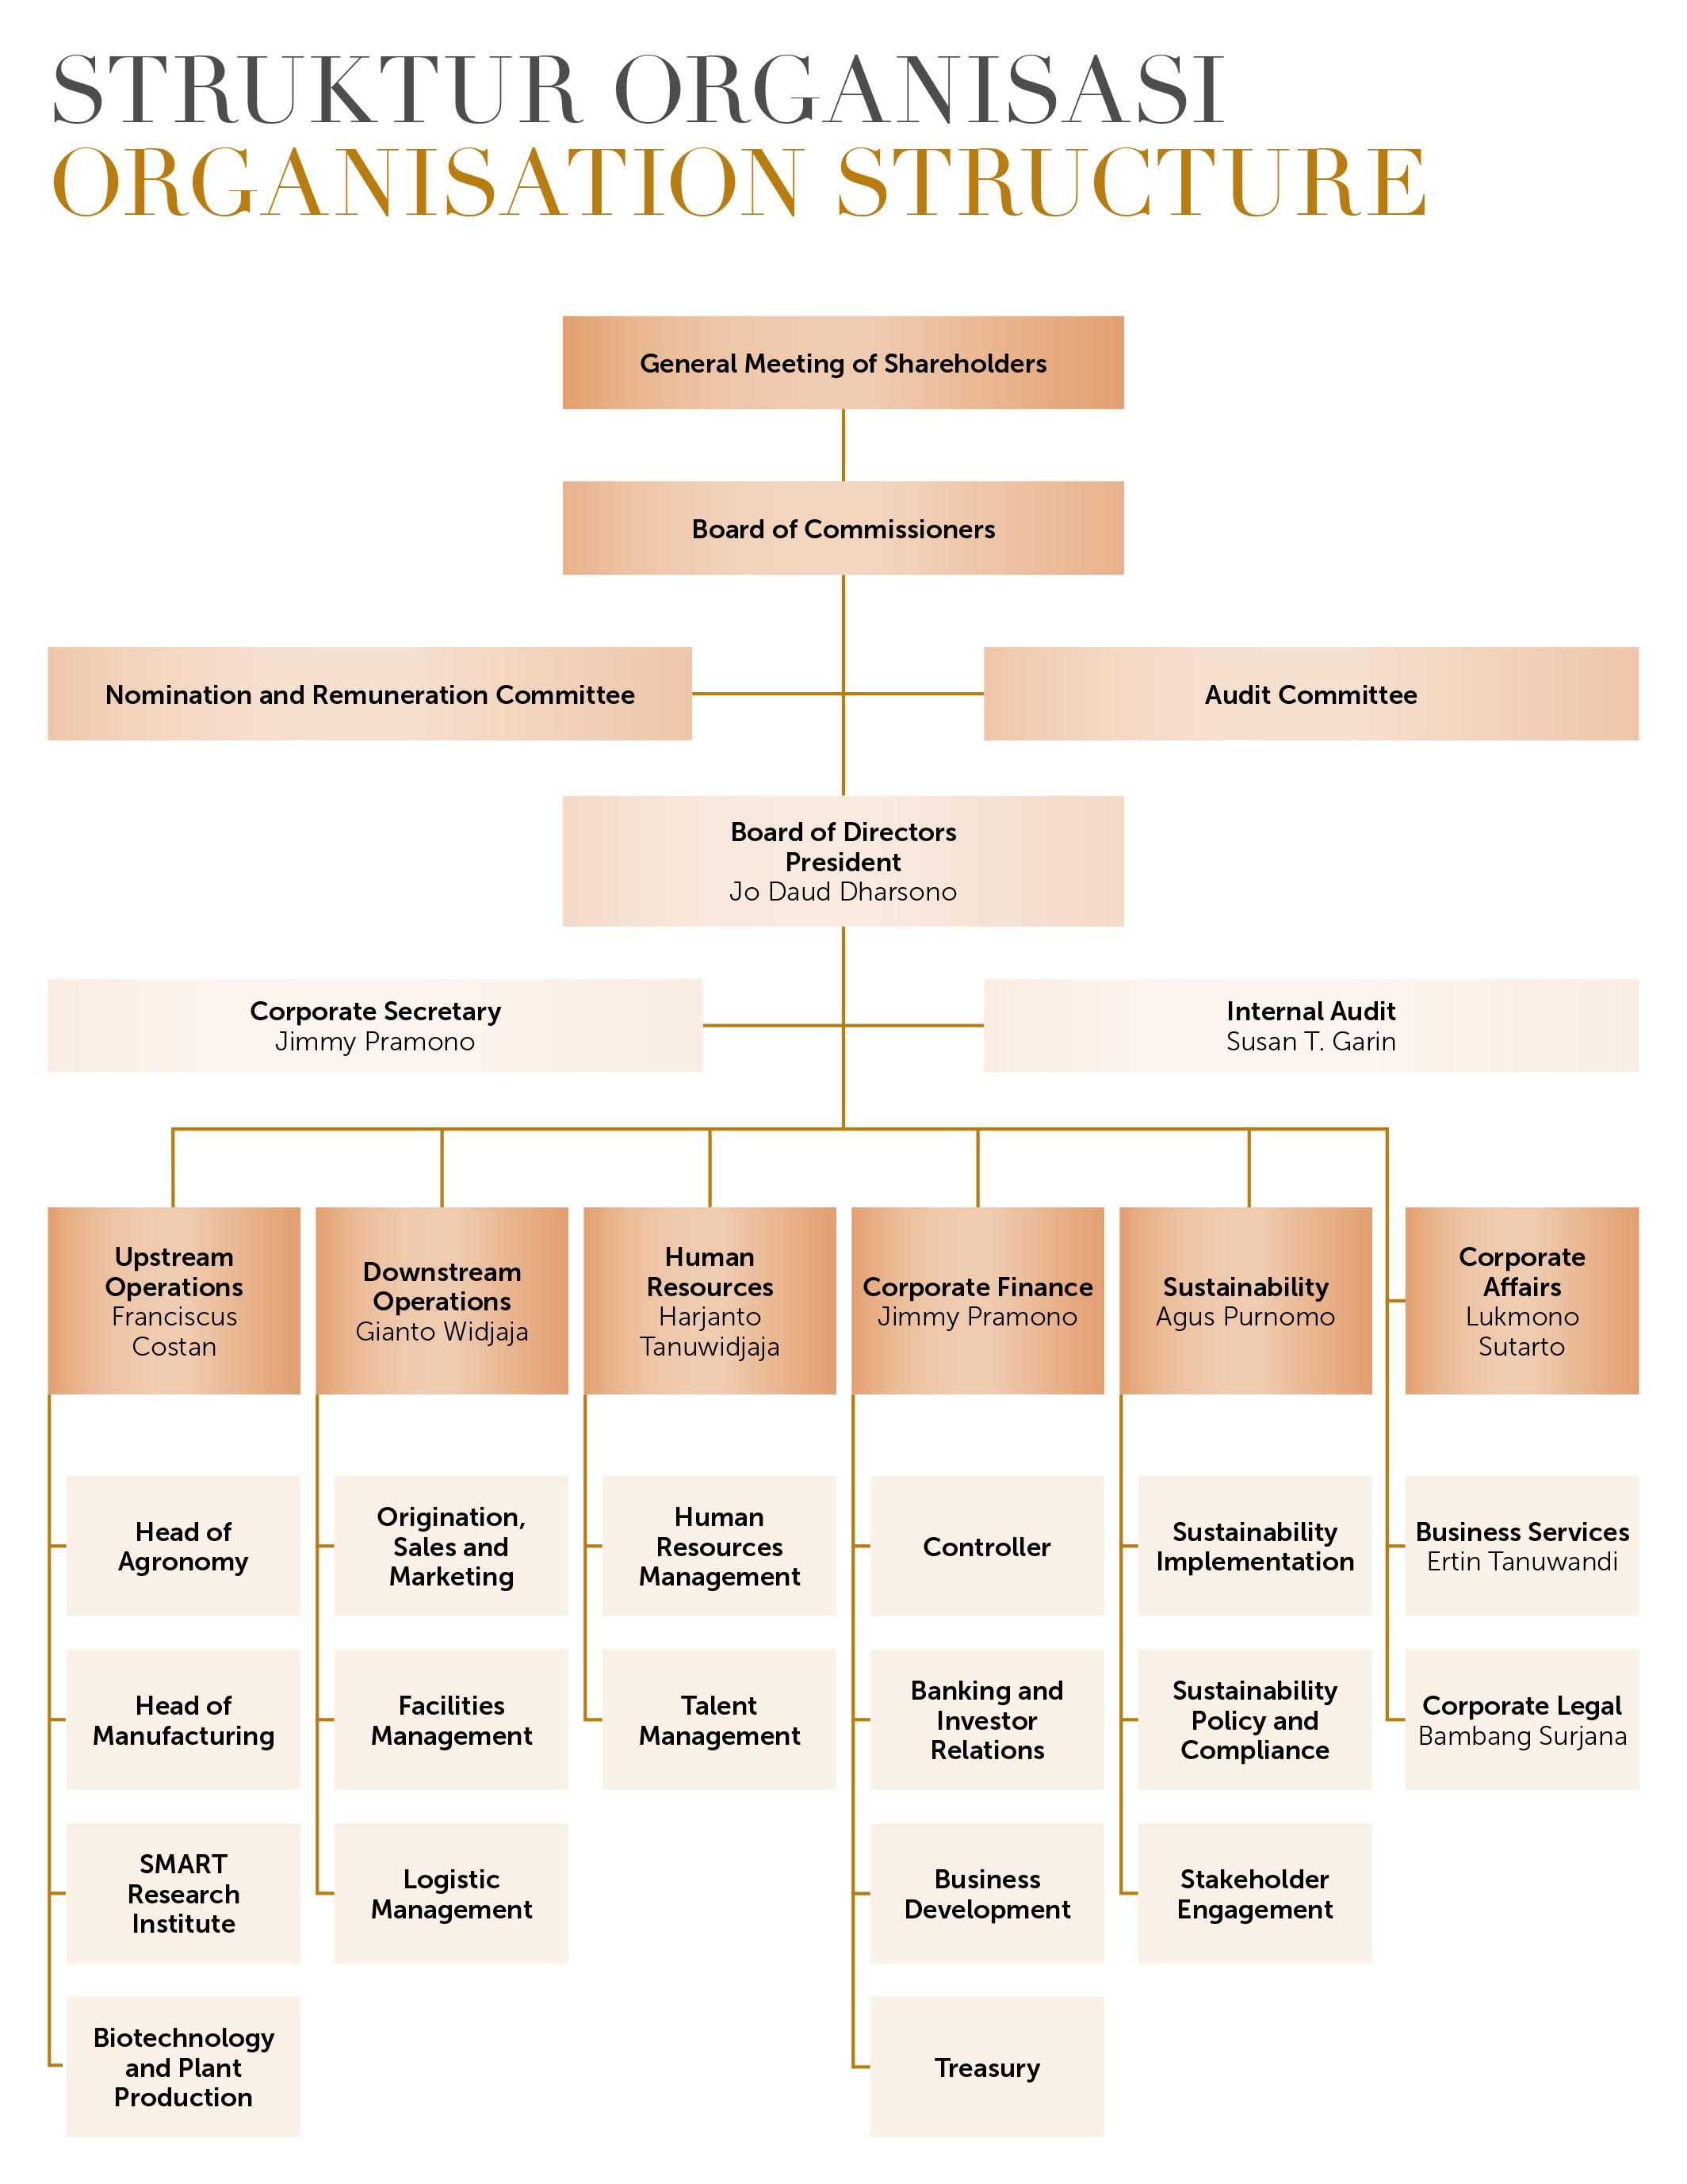 Struktur Organisasi - PT Sinar Mas Agro Resources and